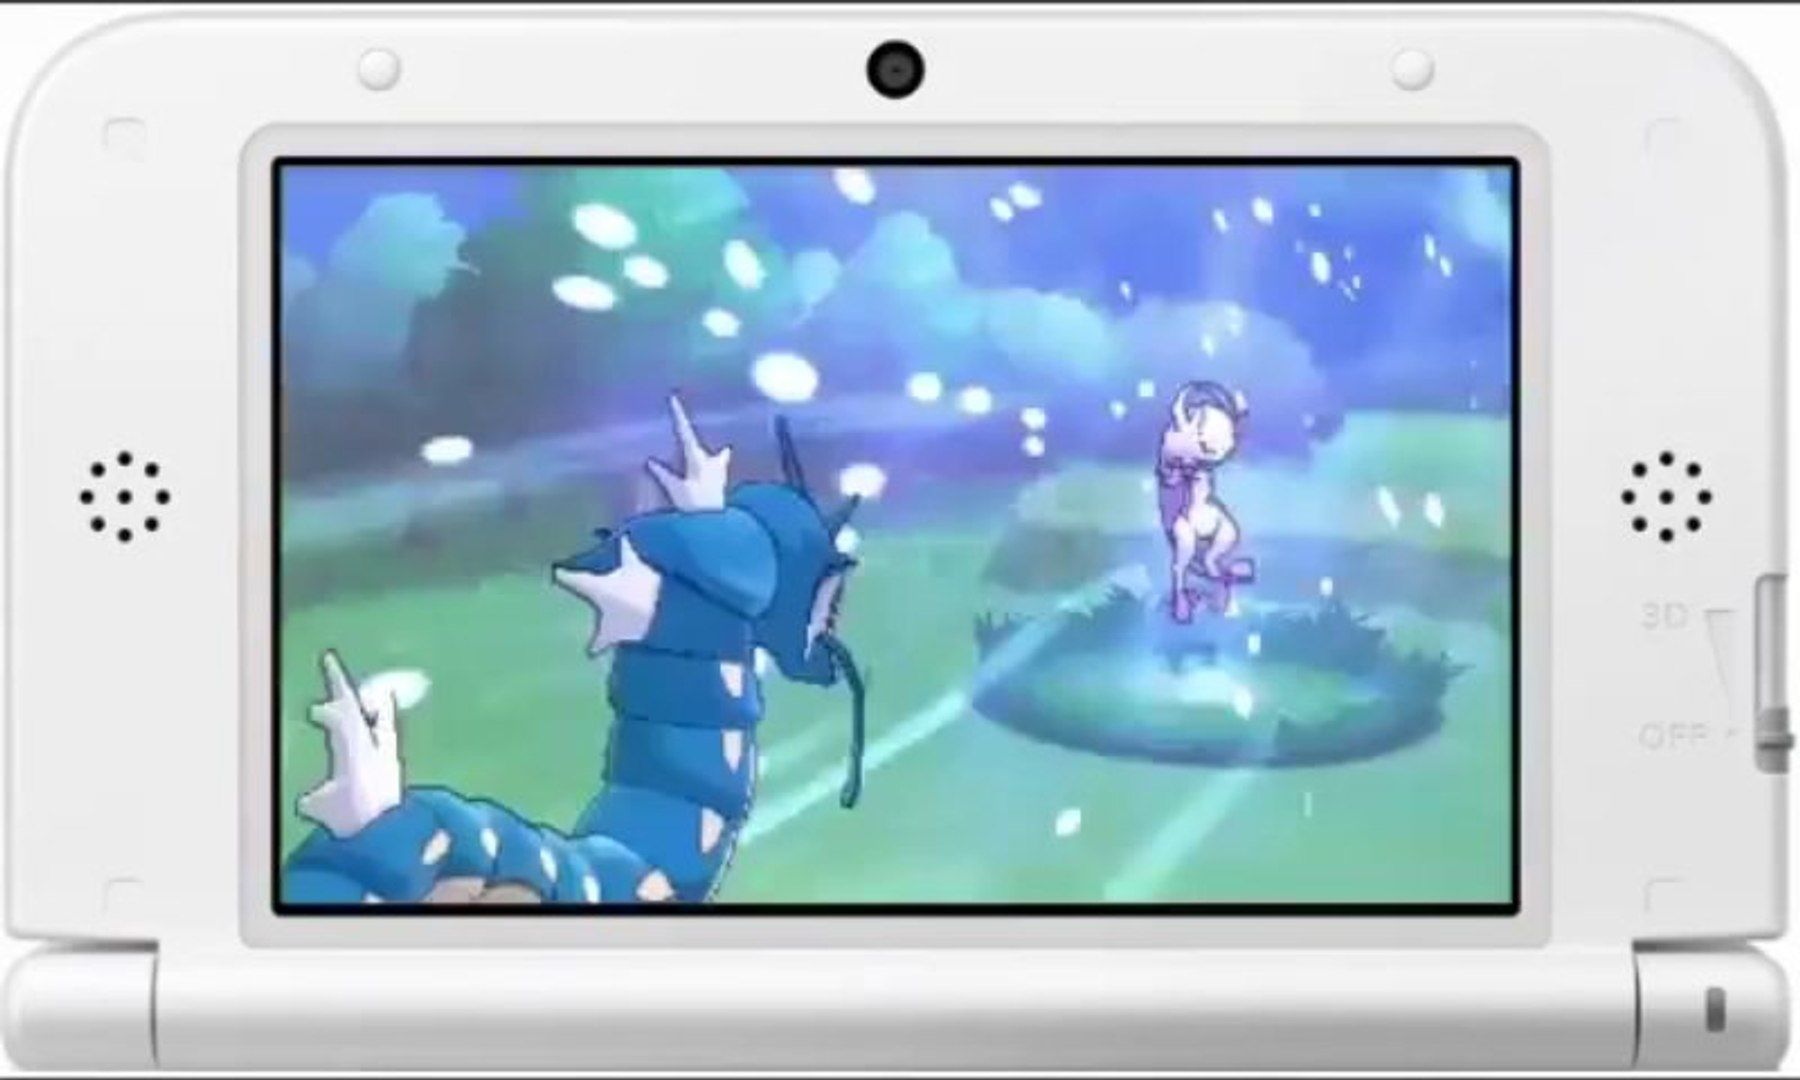 Nuovo Pokémon per Pokémon X e Pokémon Y